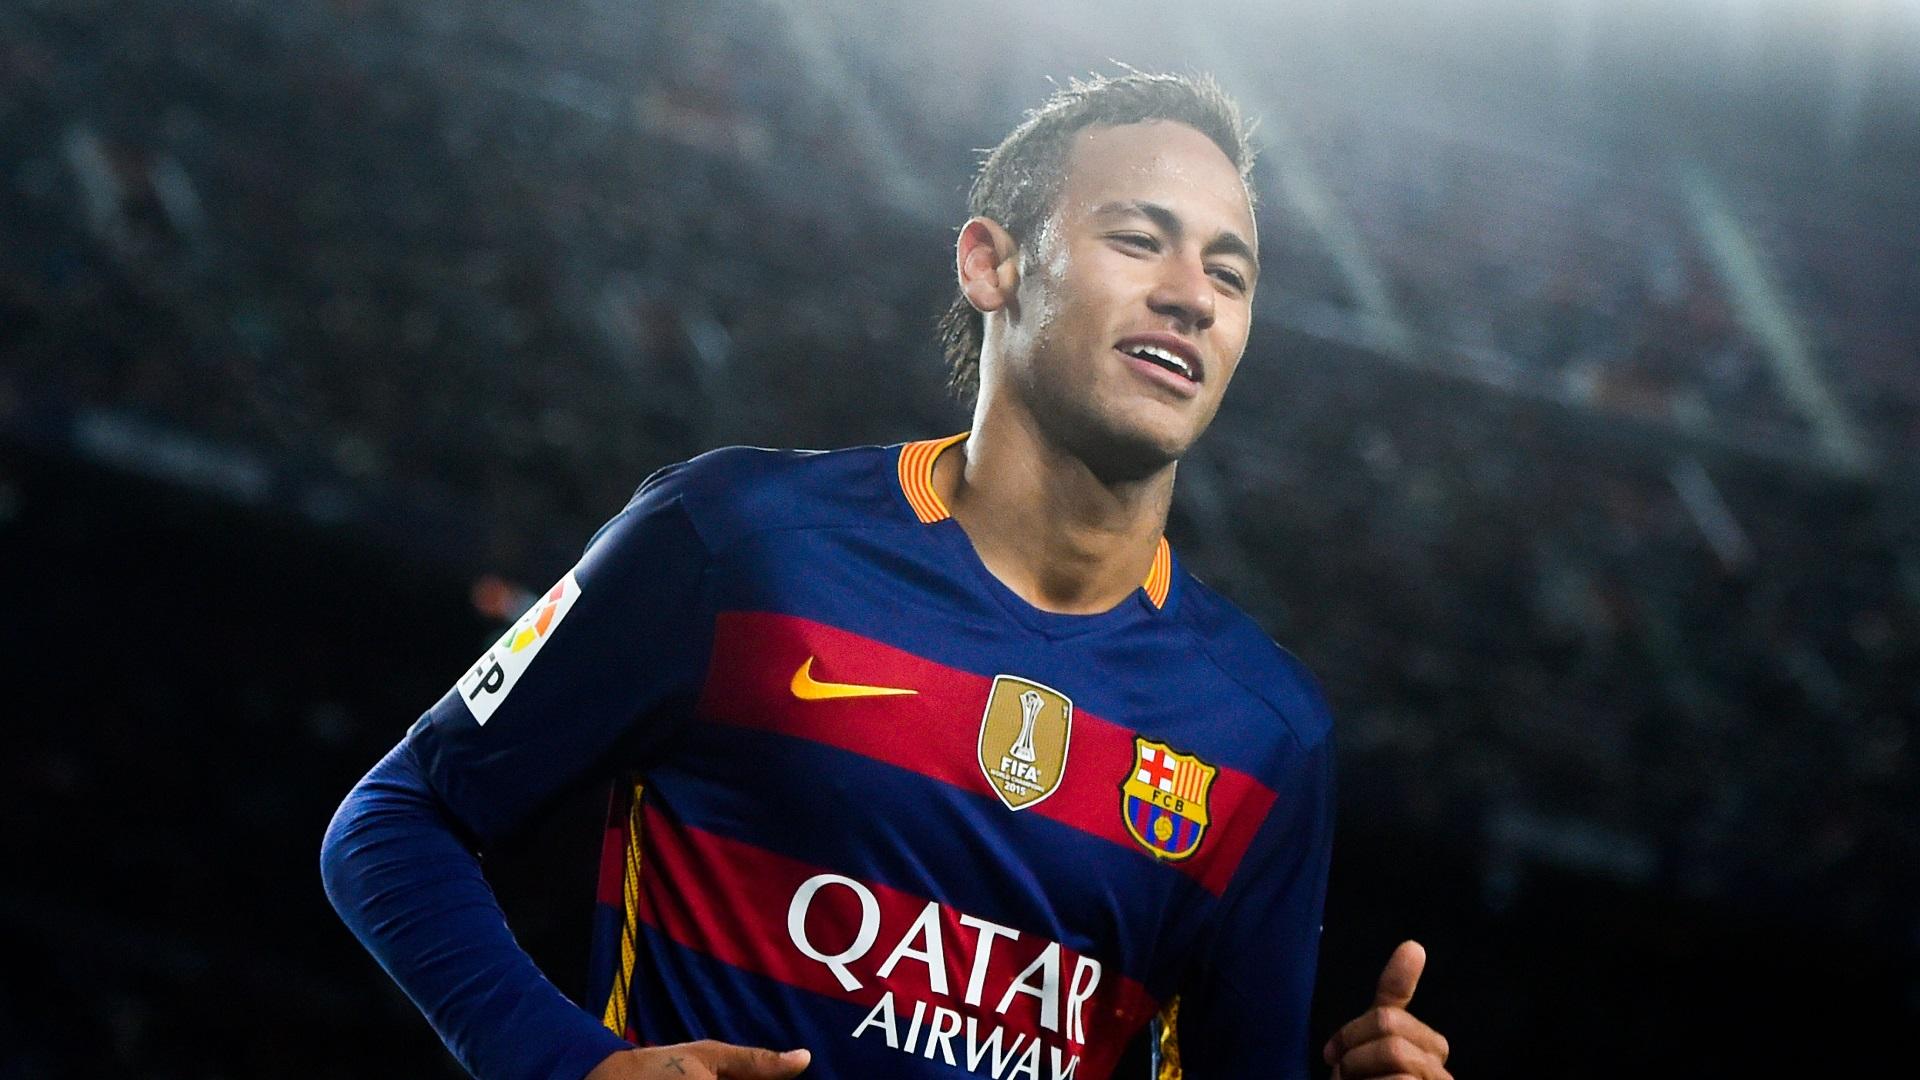 Neymar Conor Mcgregor Messi December Highlights Trace Sport